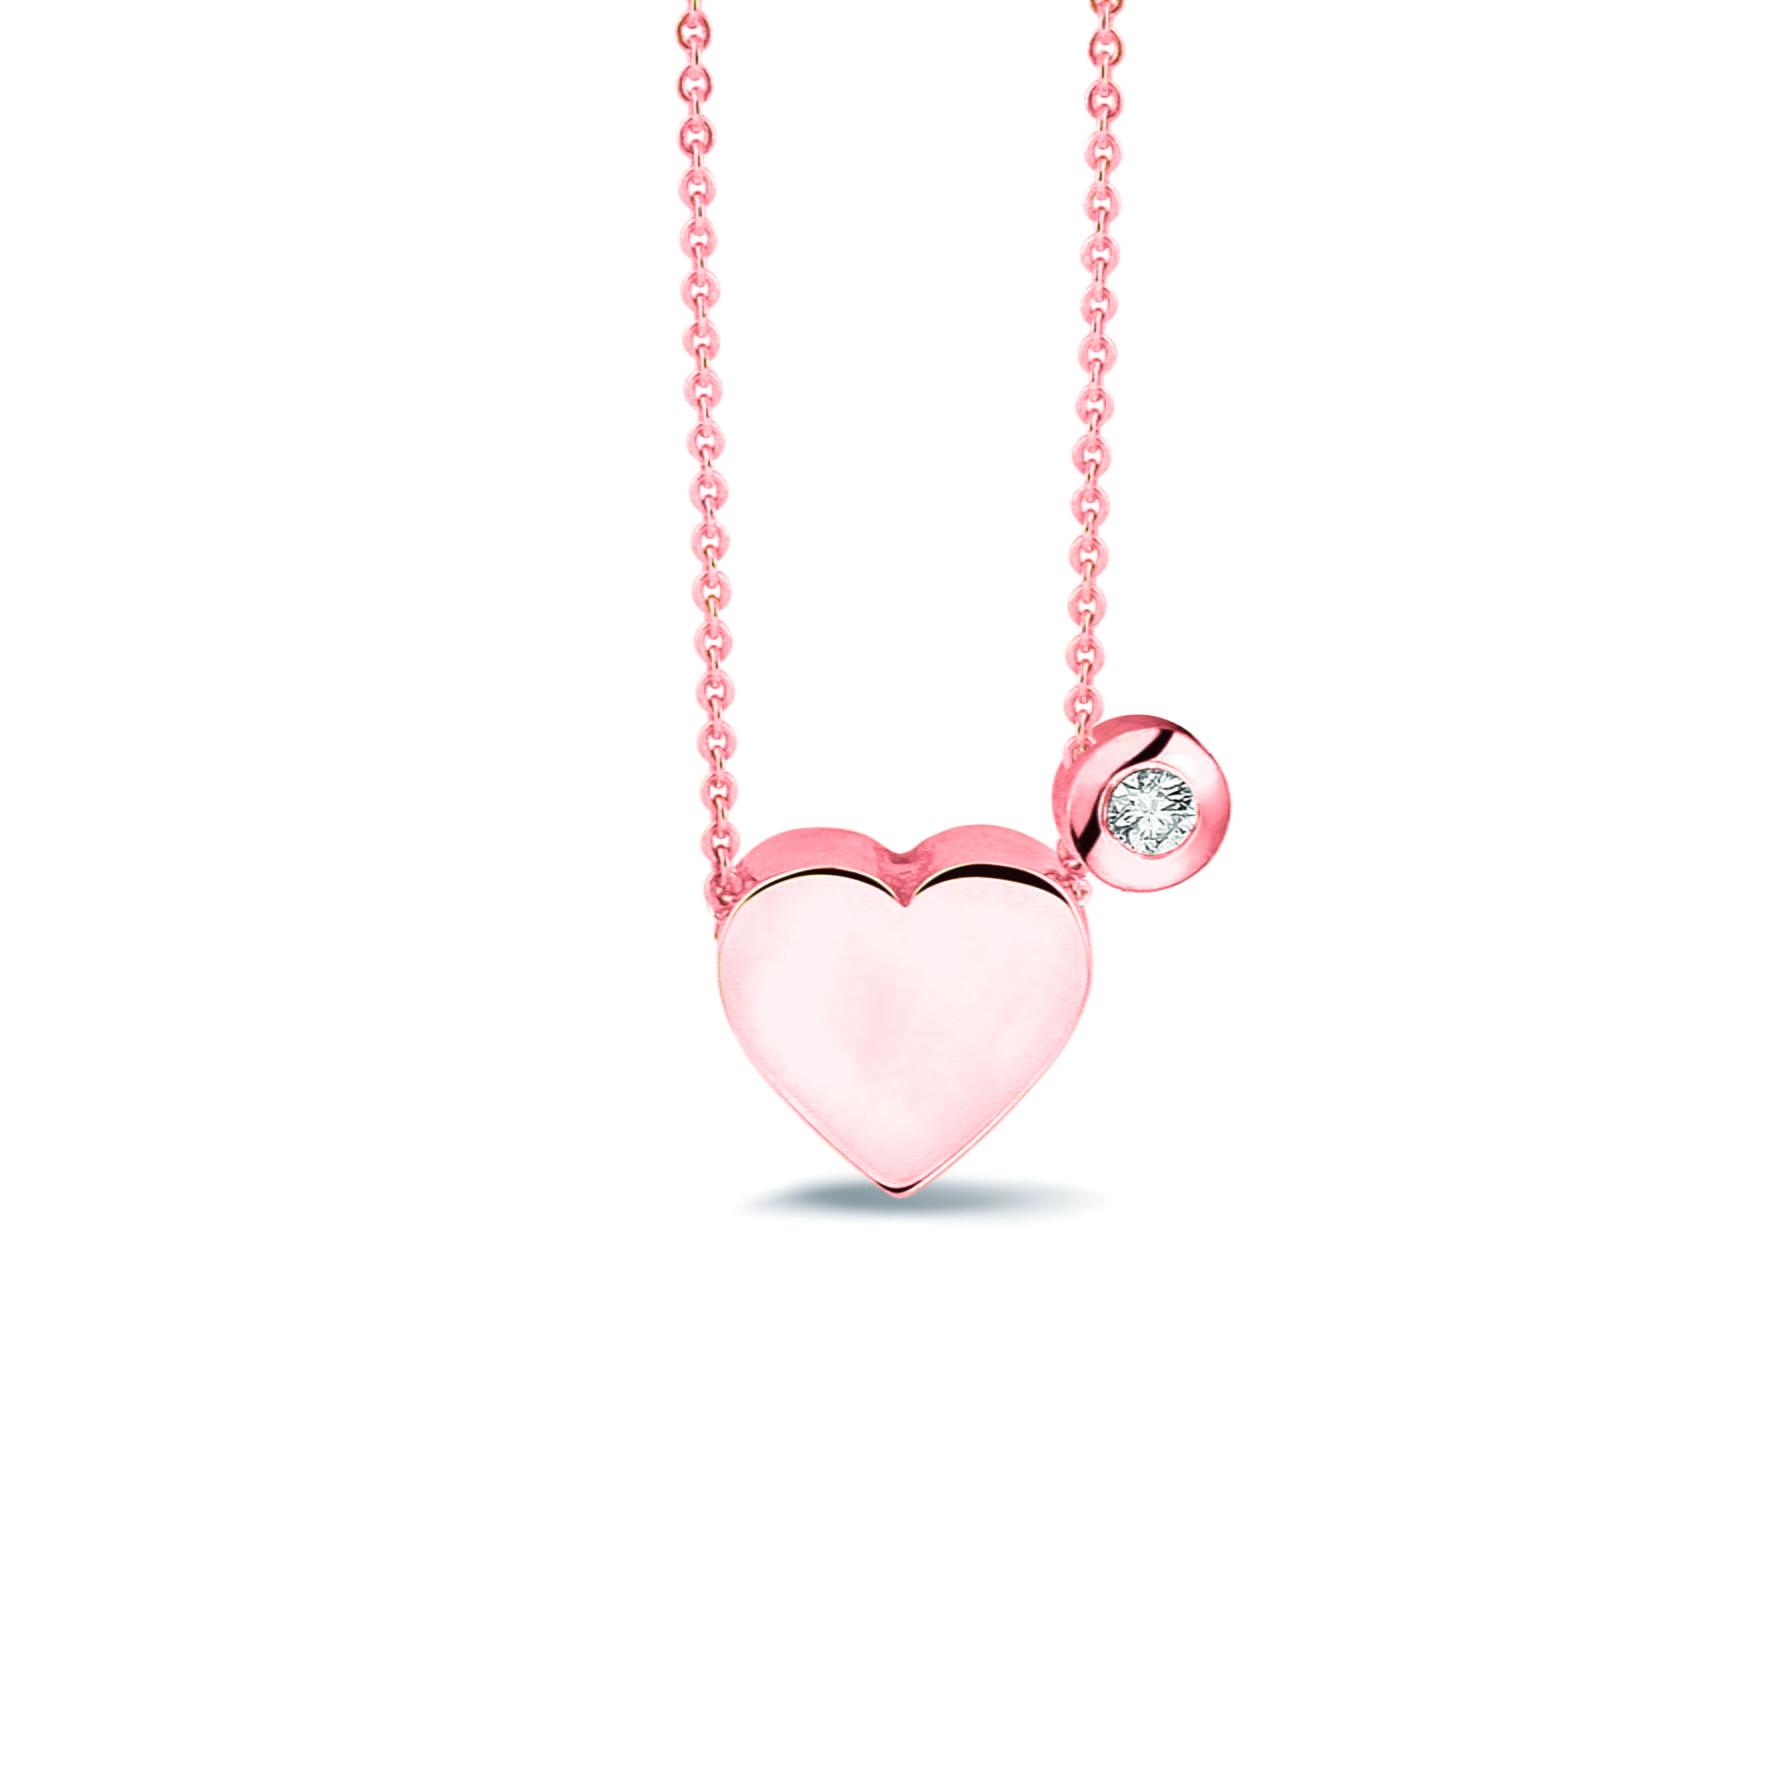 hanger hartje 701 R Rosé Goud + 707 R Diamant